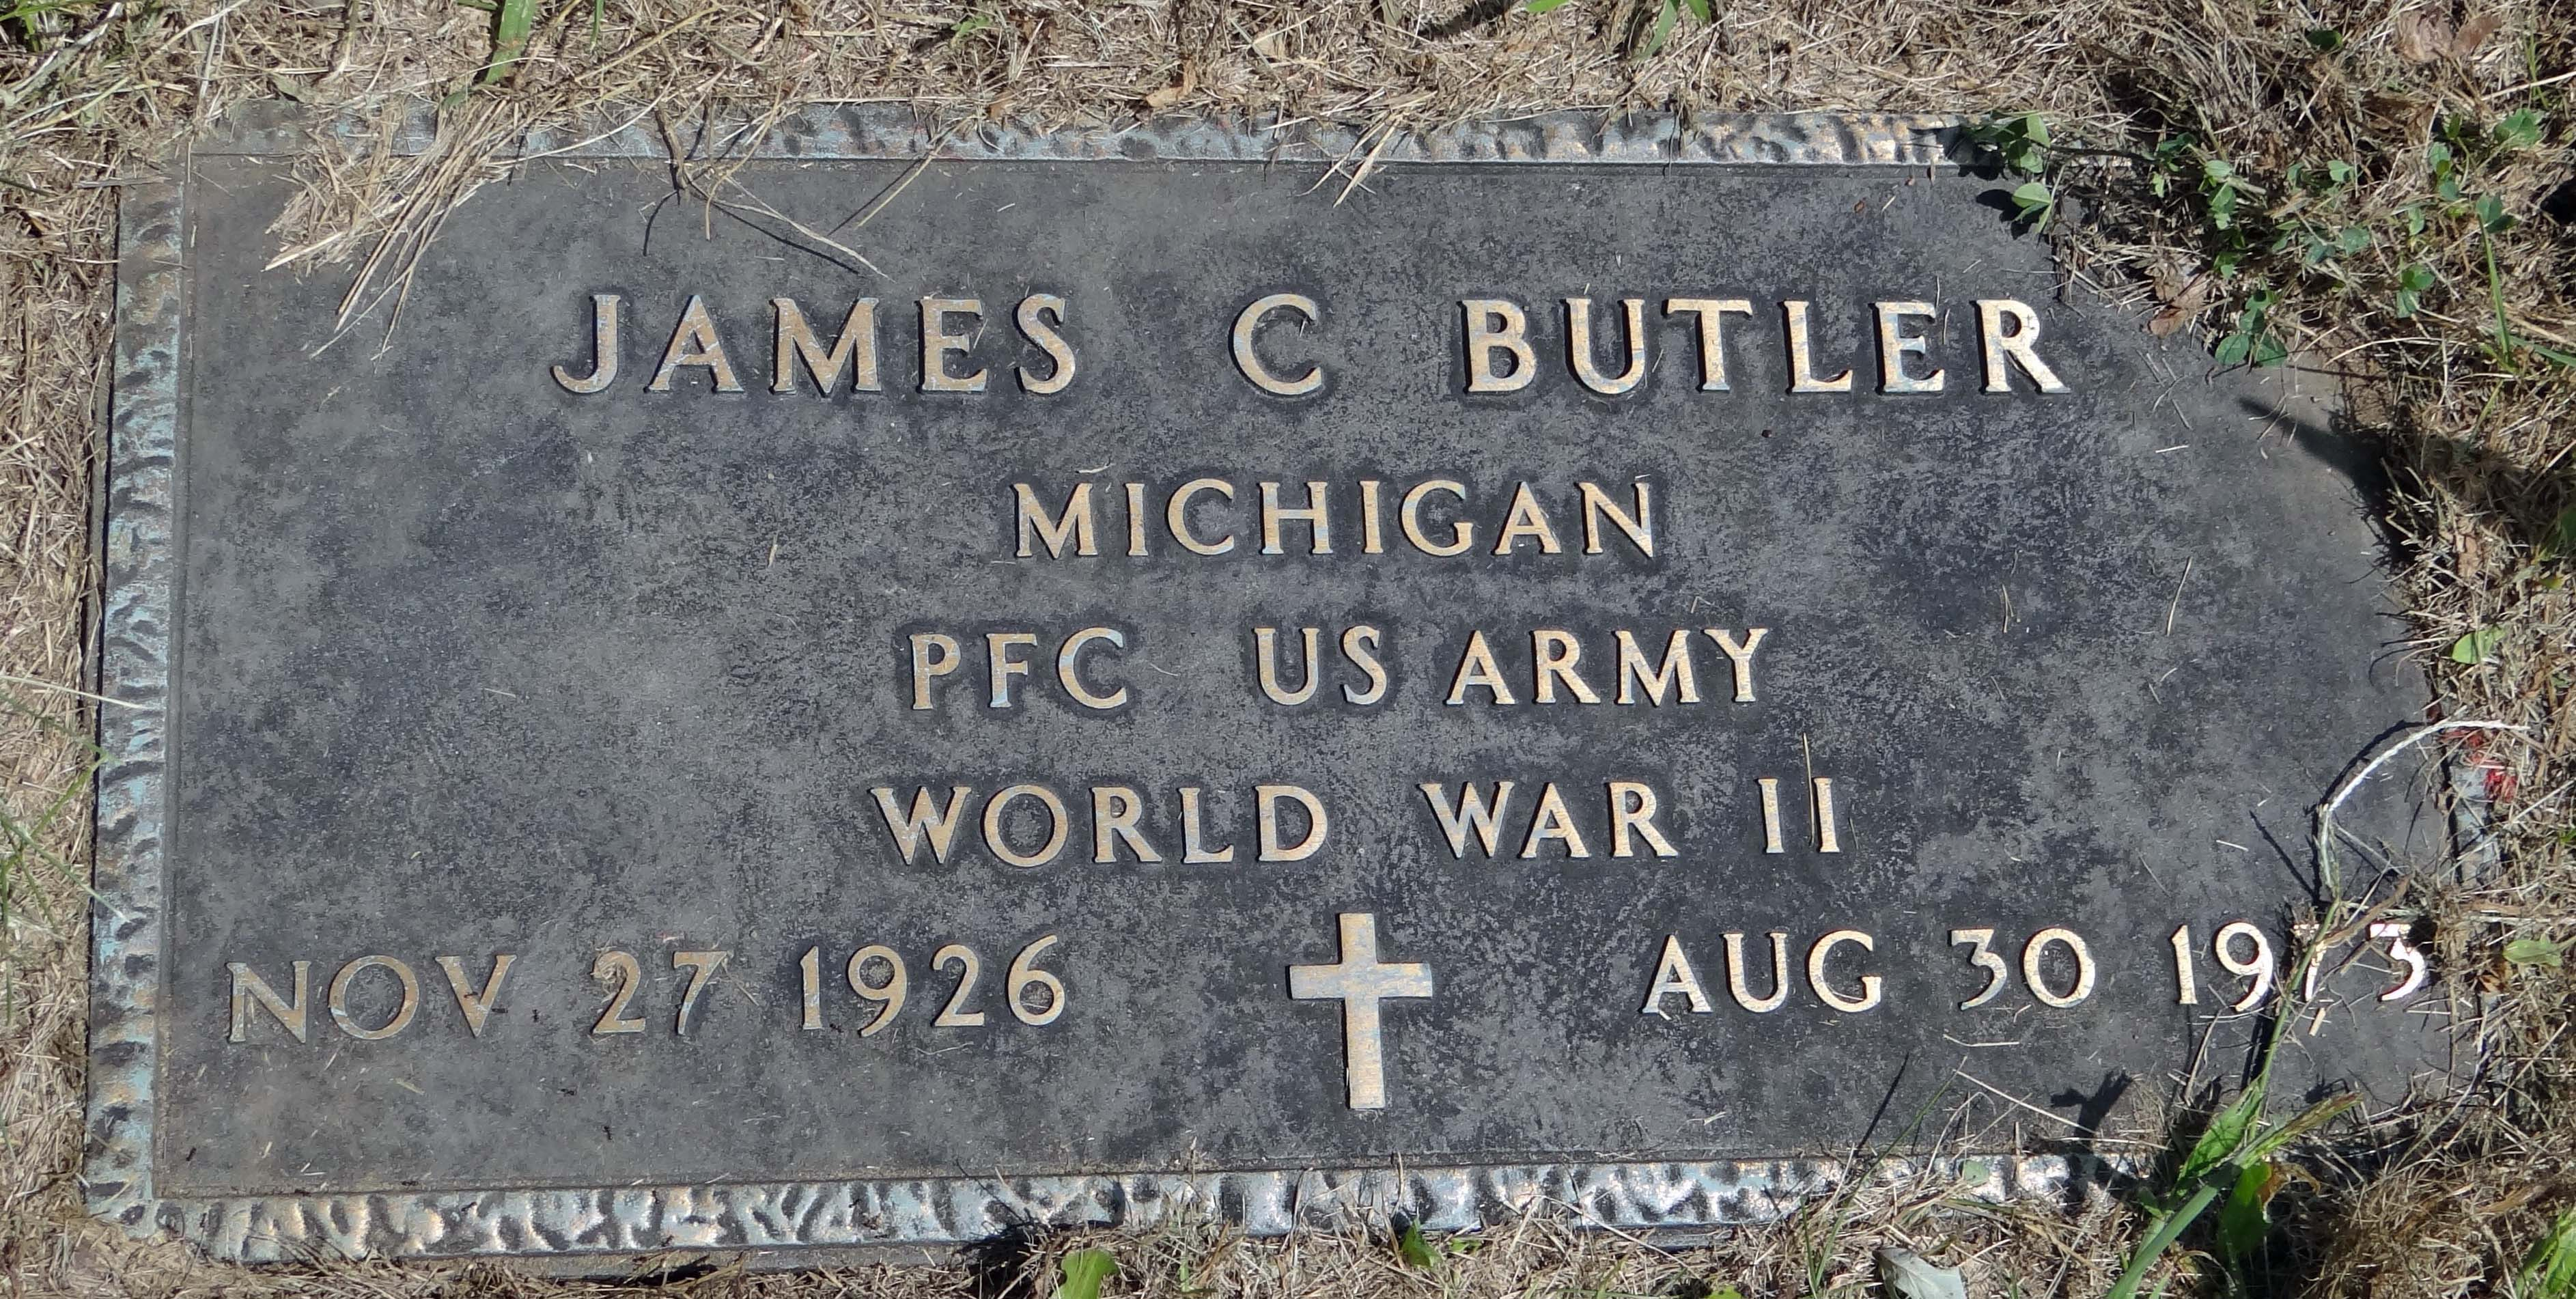 James C. Butler